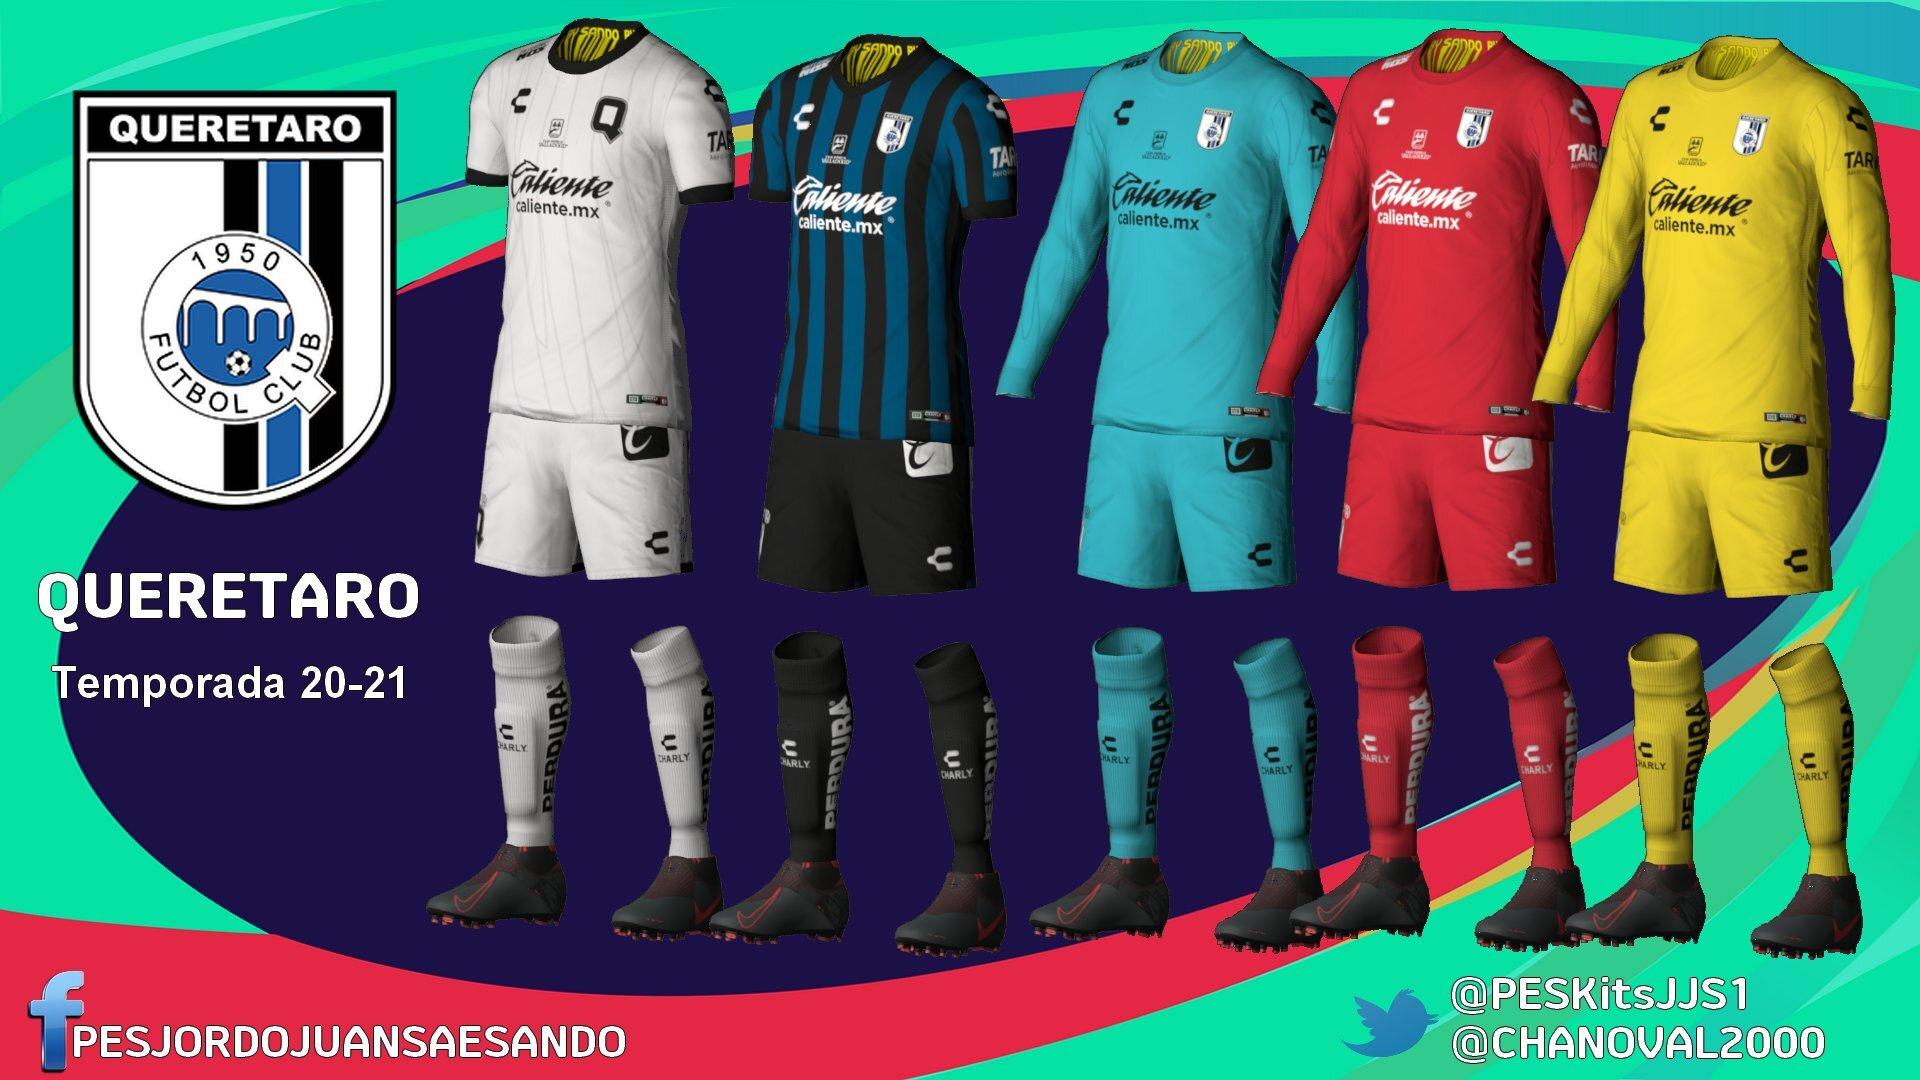 Kits Queretaro FC 2020/2021 by Sando